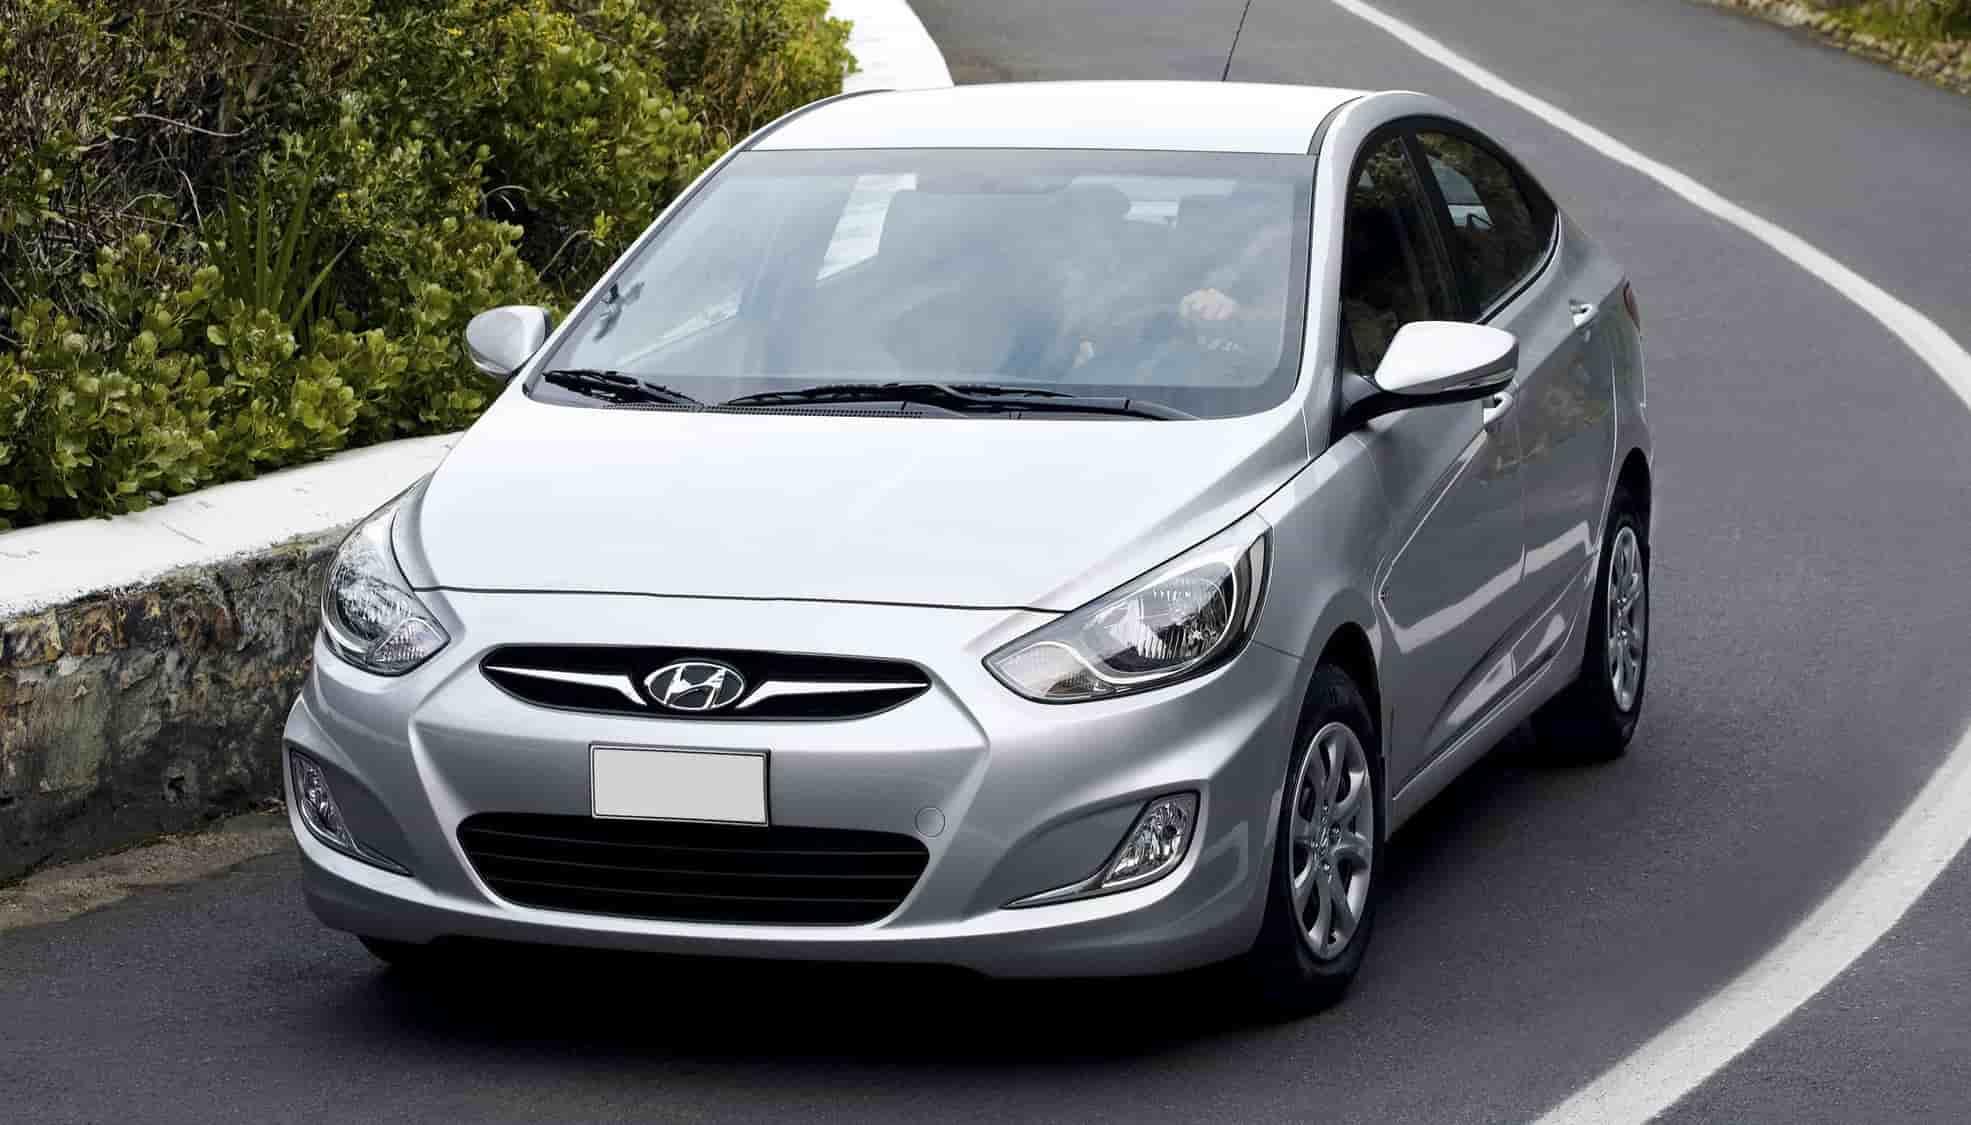 Hyundai Solaris I